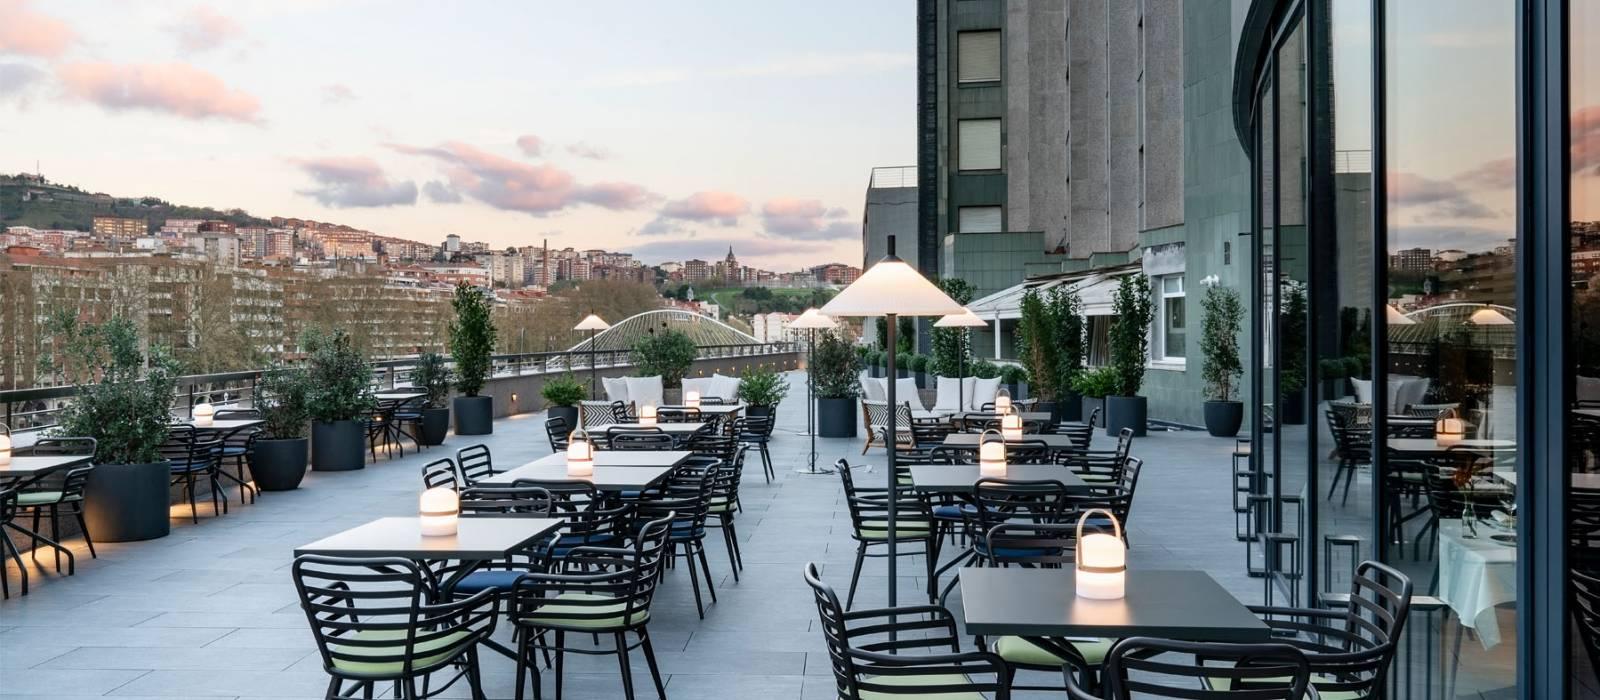 Hotel Vincci Consulado de Bilbao Terrasse Restaurant